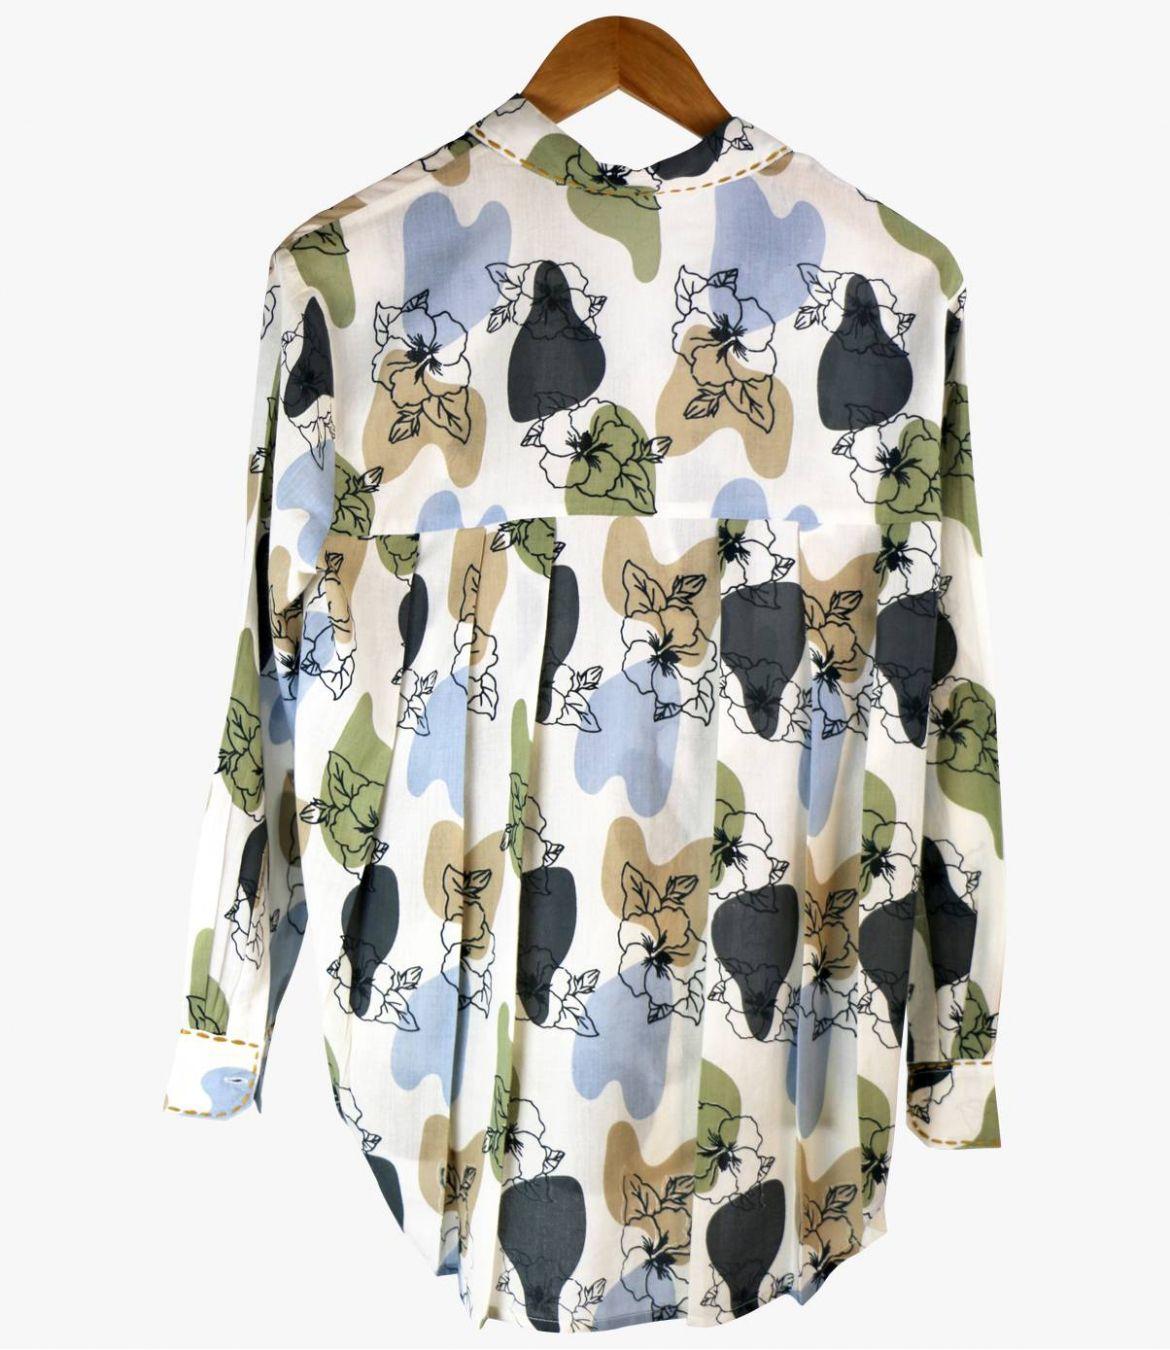 CARI VANYA Cotton Shirt for Women Storiatipic - 2